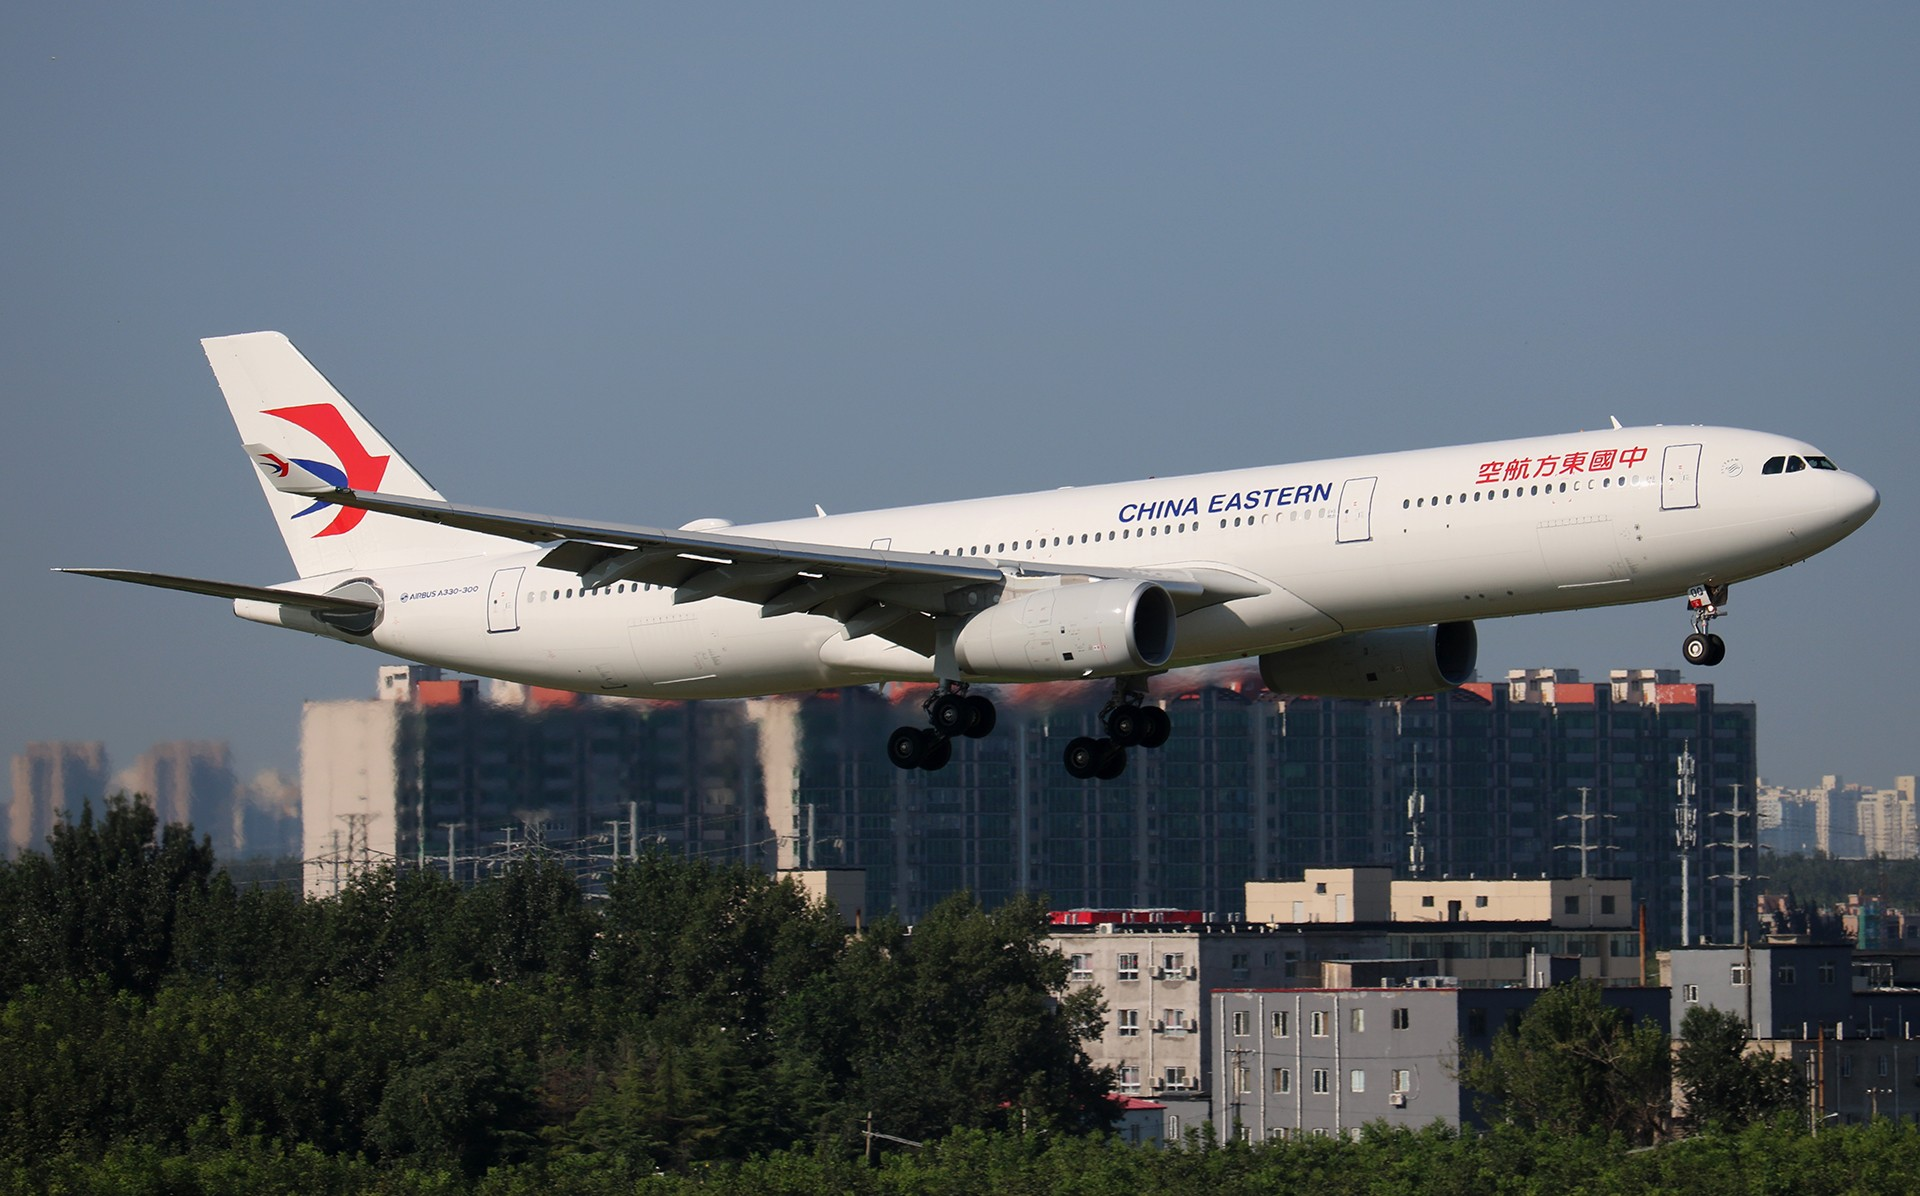 Re:[原创]LIULIU|【PEK】36L降落一组Ⅴ|城市背景下的进近 AIRBUS A330-300 B-300Q 中国北京首都国际机场